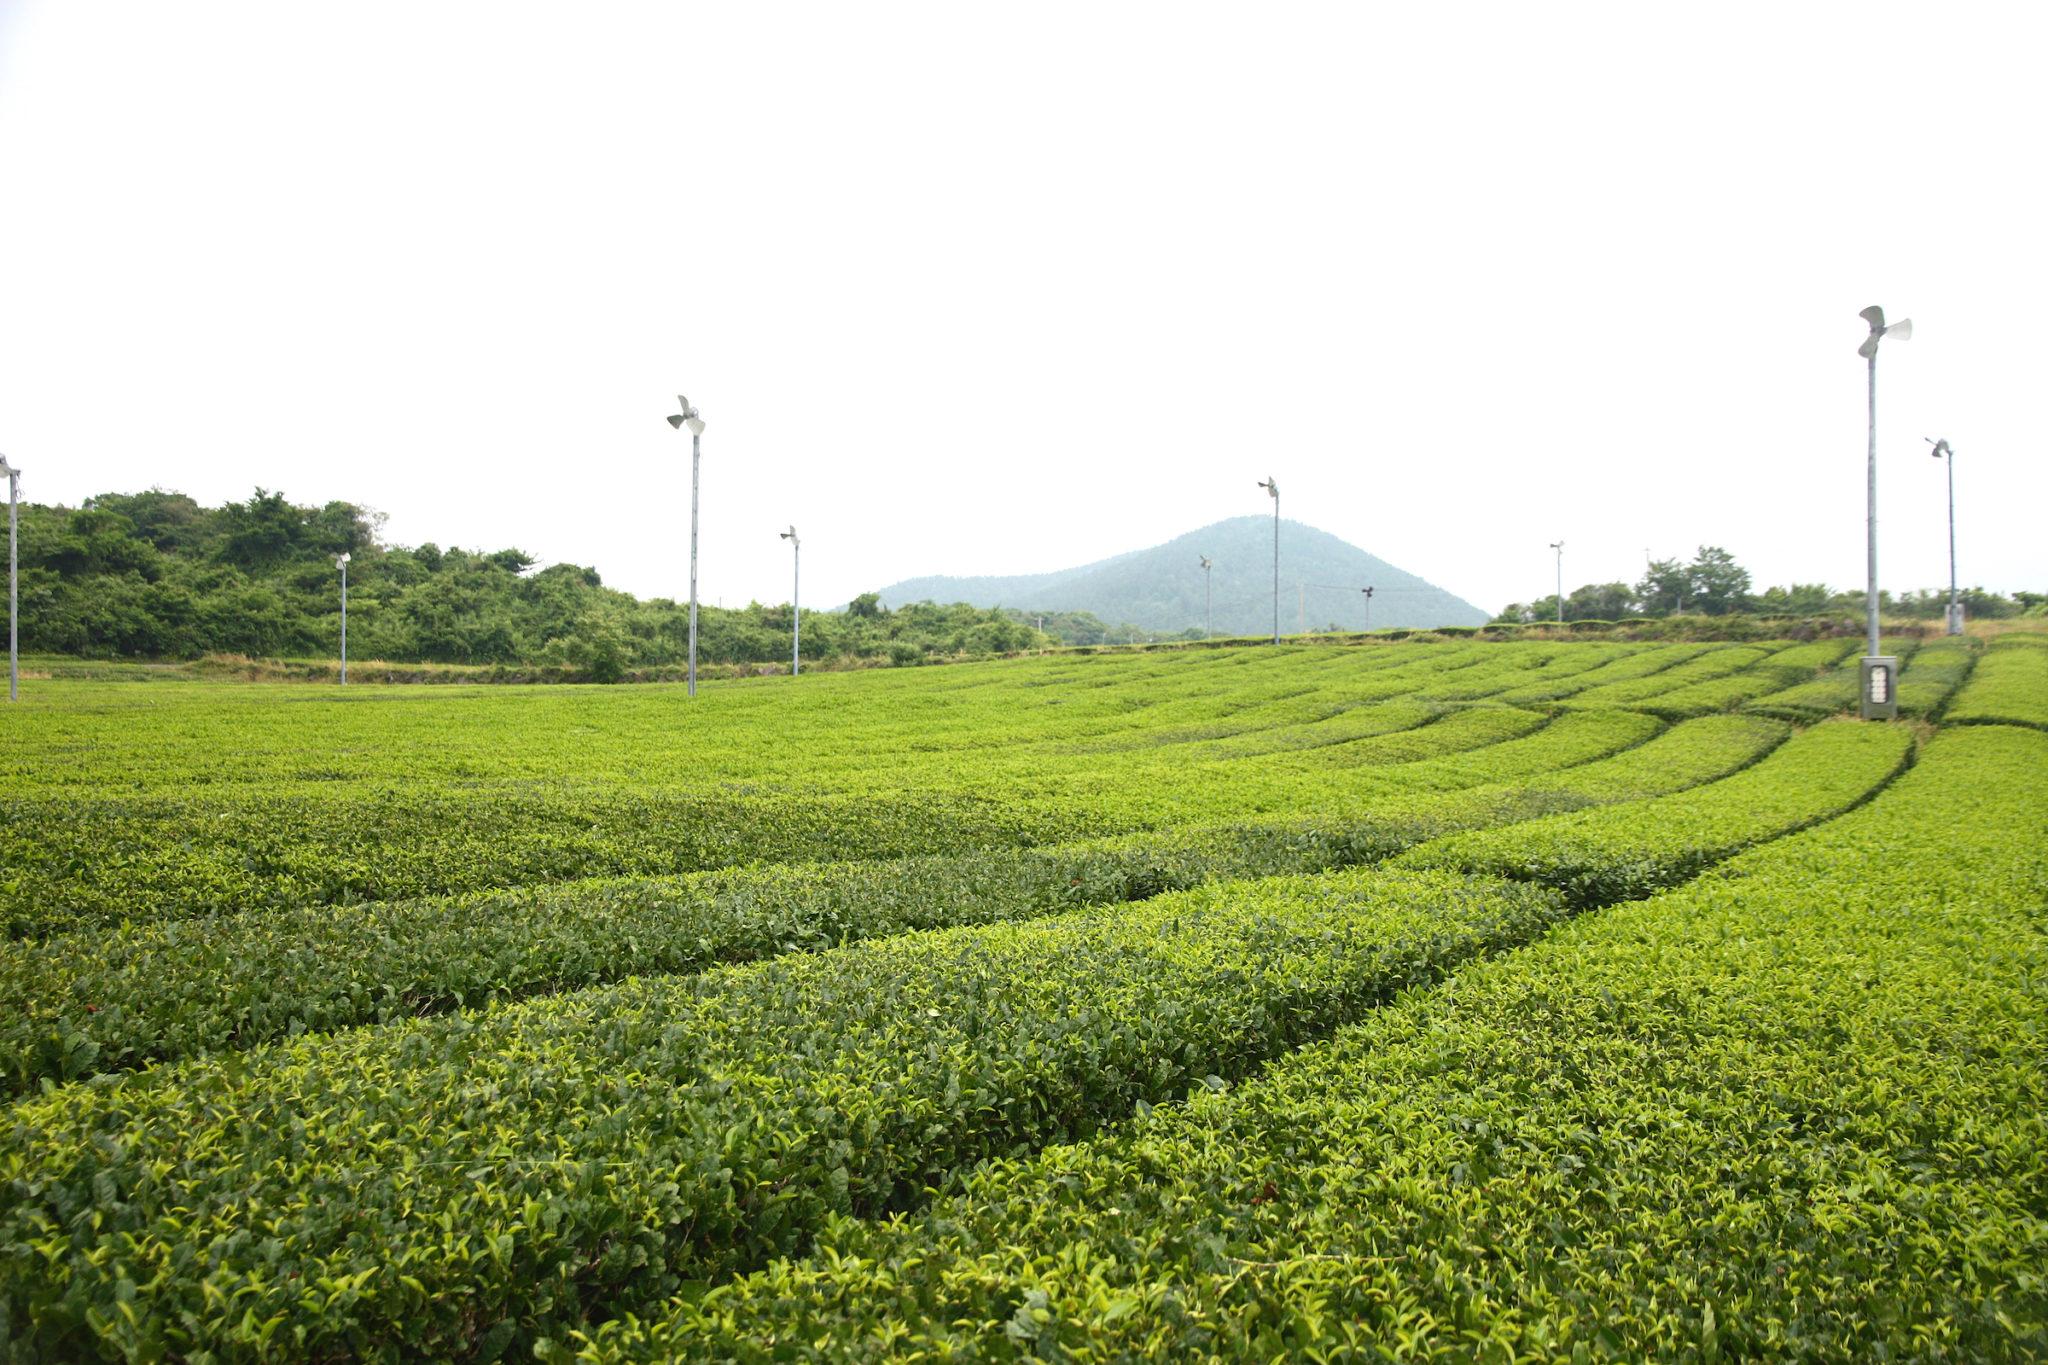 Jeju Road Trip Itinerary Day 2: O'Sulloc Tea Museum, Innisfree Jeju House, Aewol (Cafe Monsant)